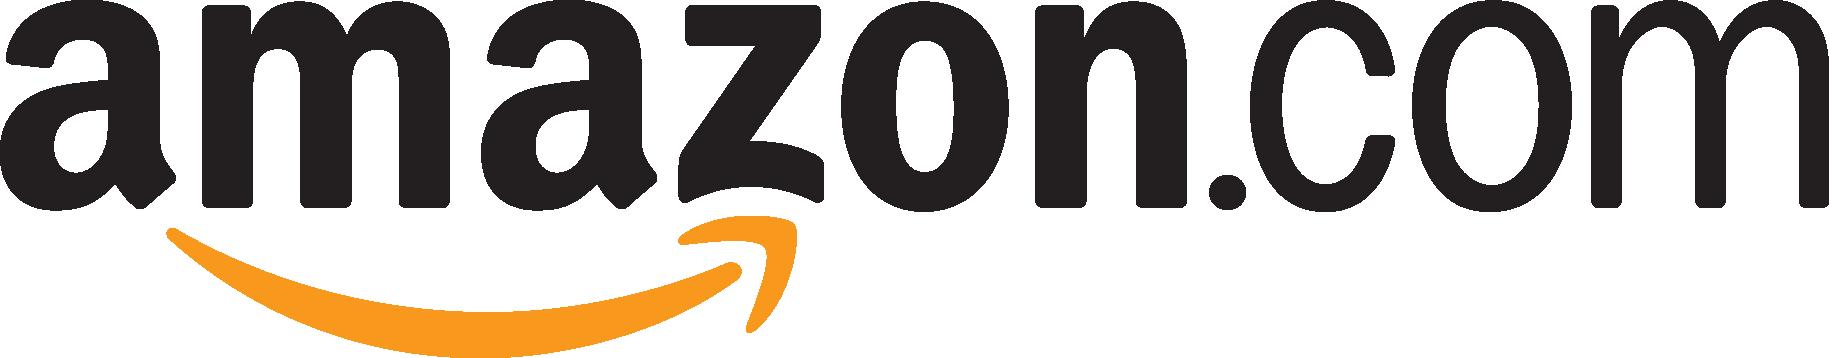 Amazon.com vs Amazon.ca: Guide to Online Cross Border.